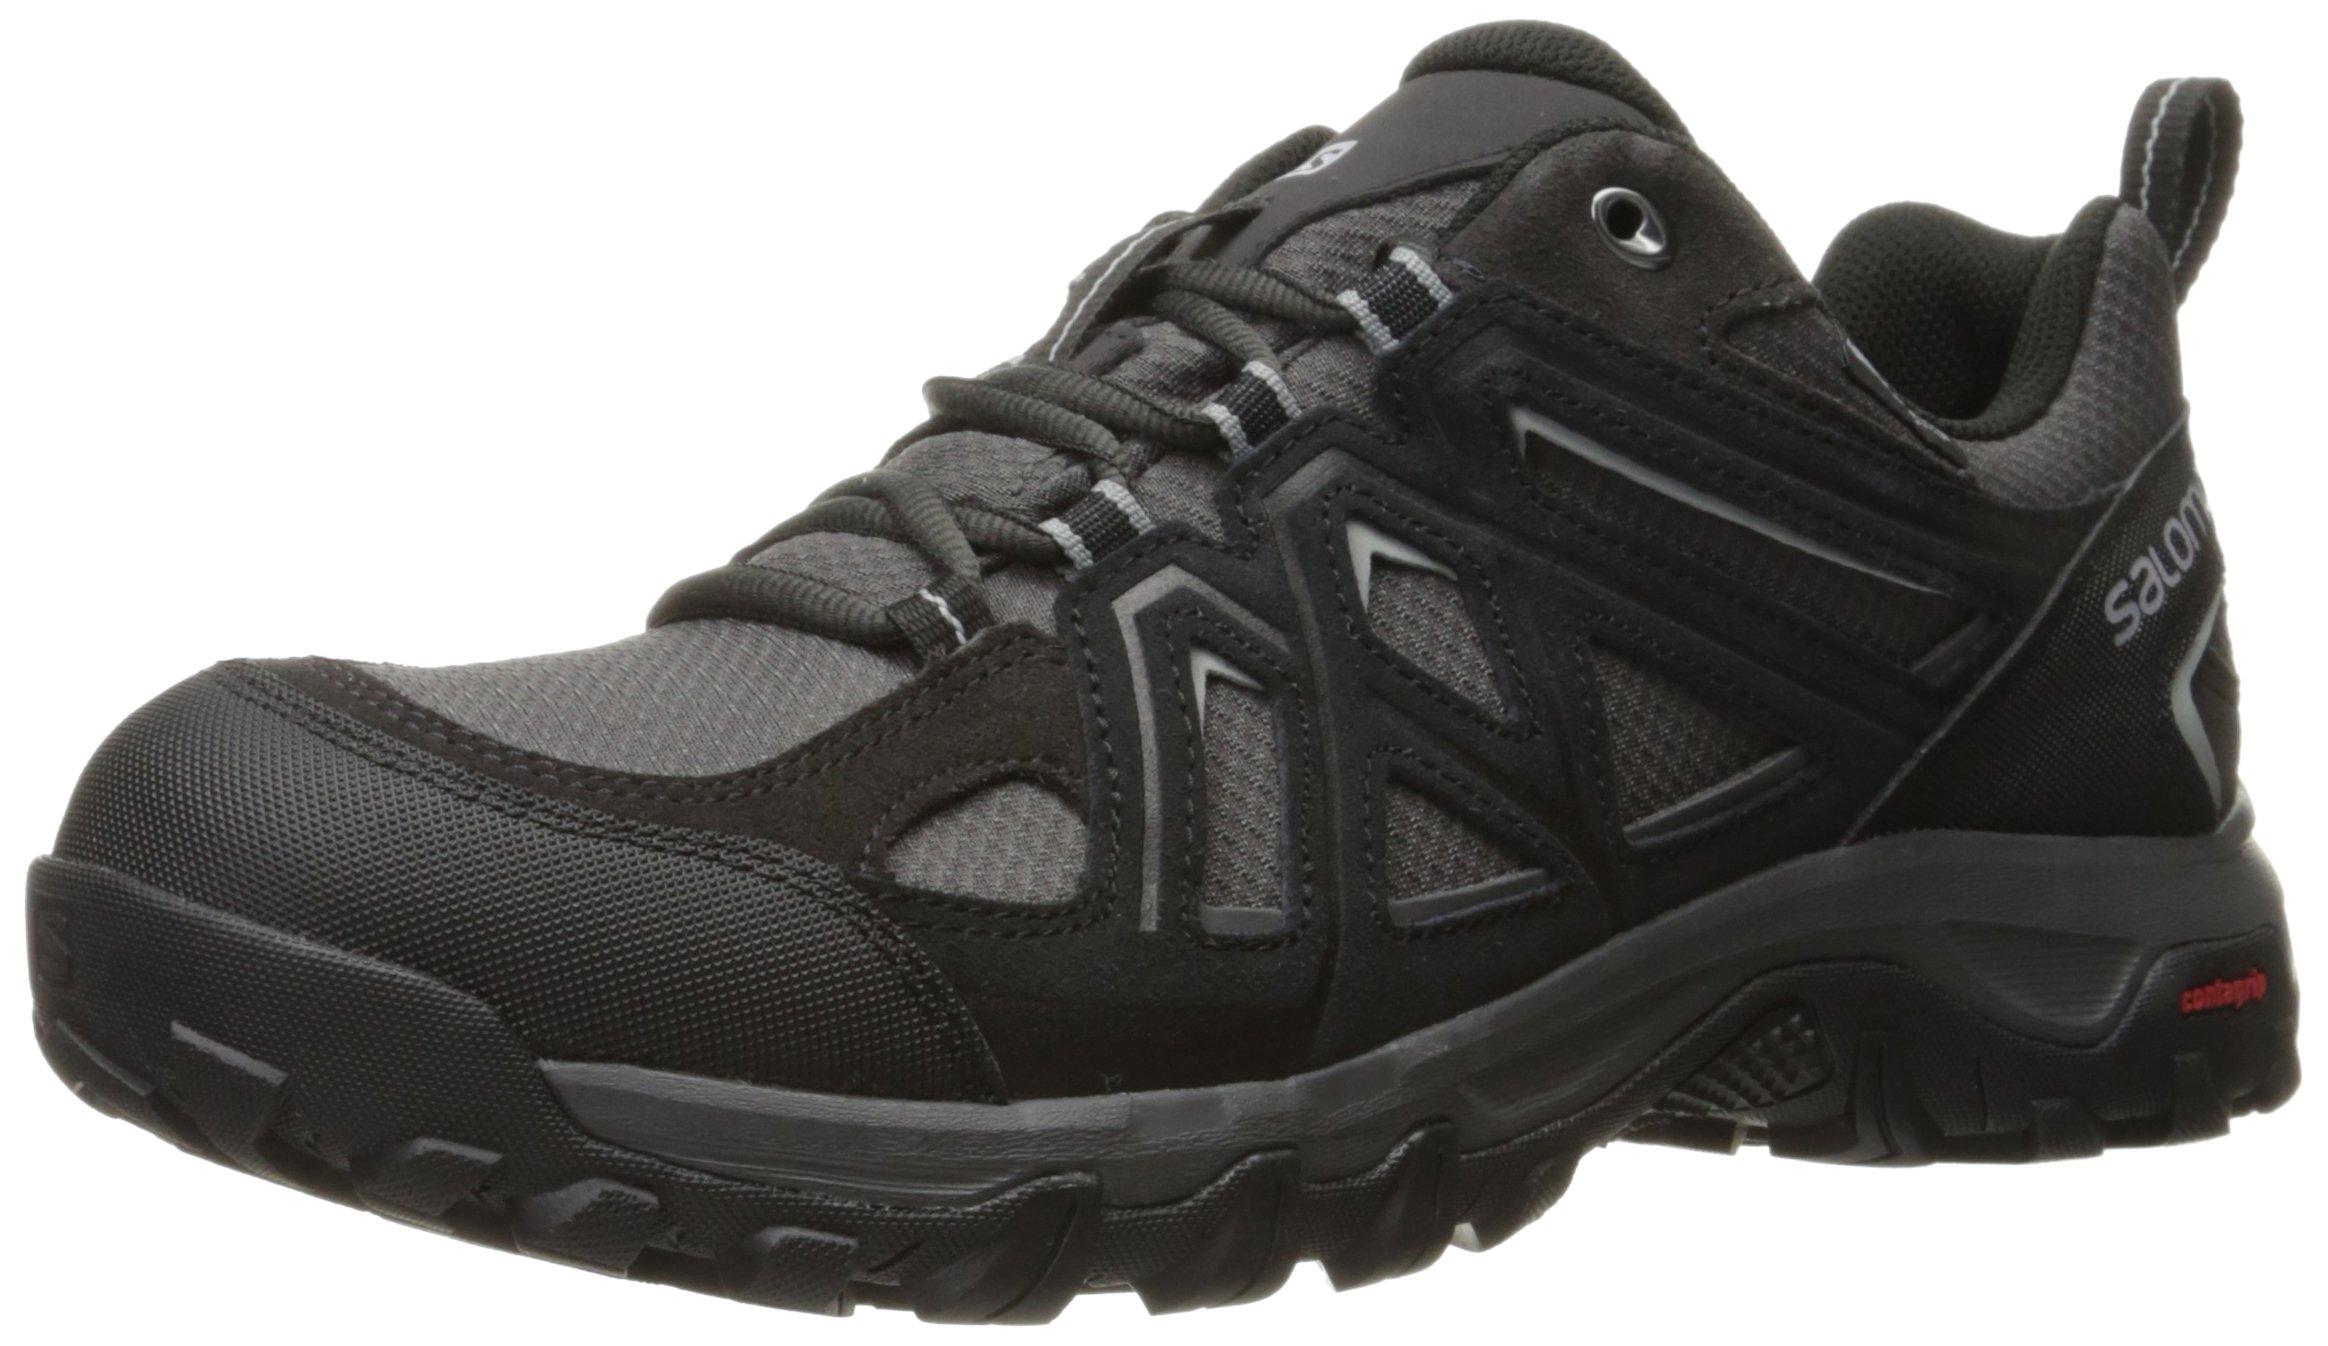 Salomon Men's Evasion 2 CS Waterproof Hiking-Shoes, Magnet, 9 M US